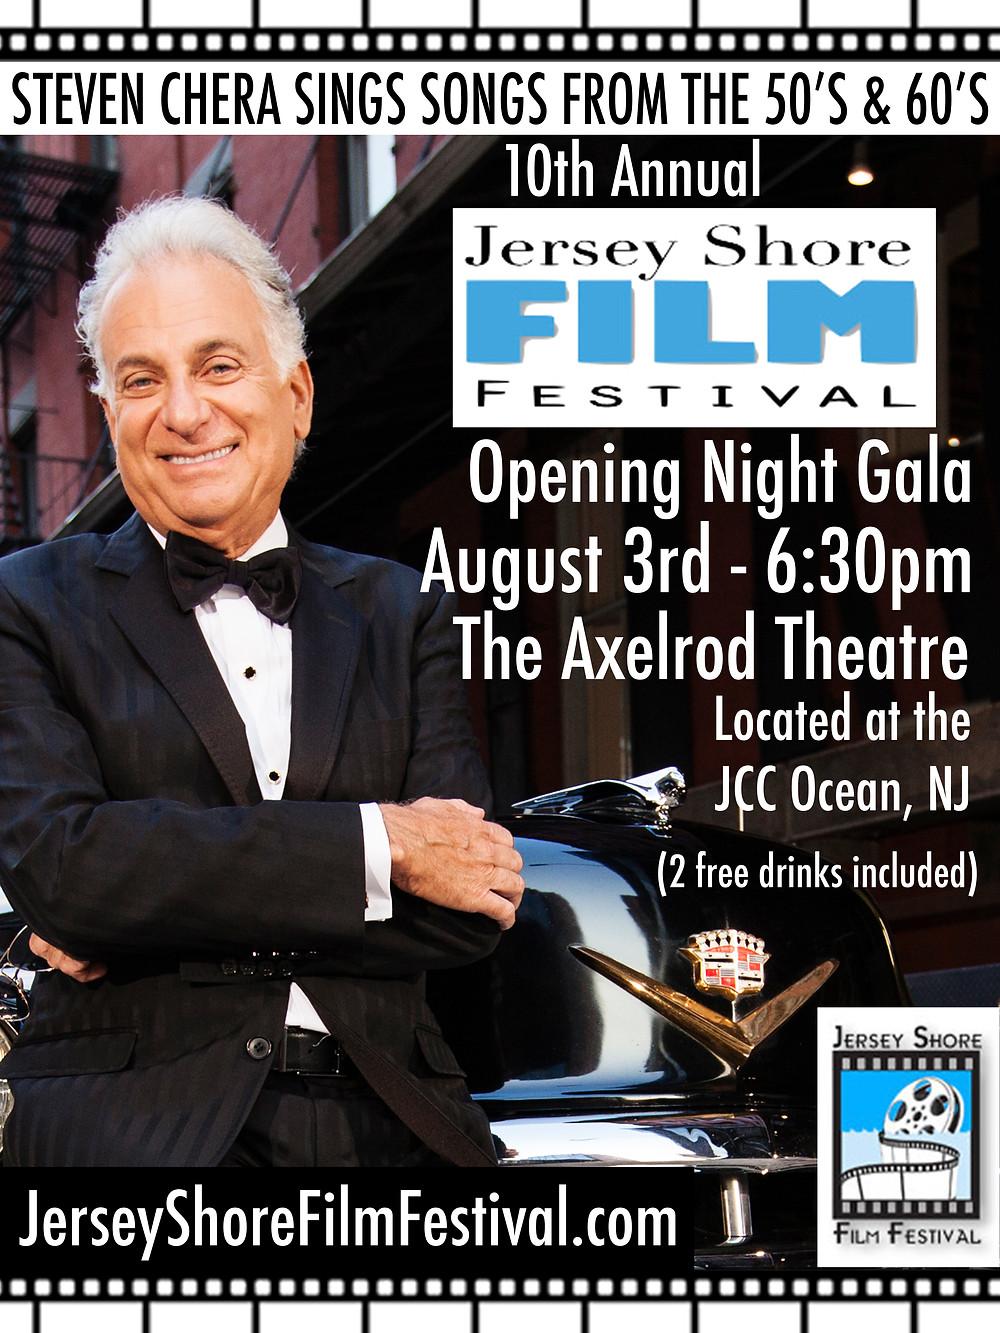 Steven Chera - Jersey Shore Film Festival